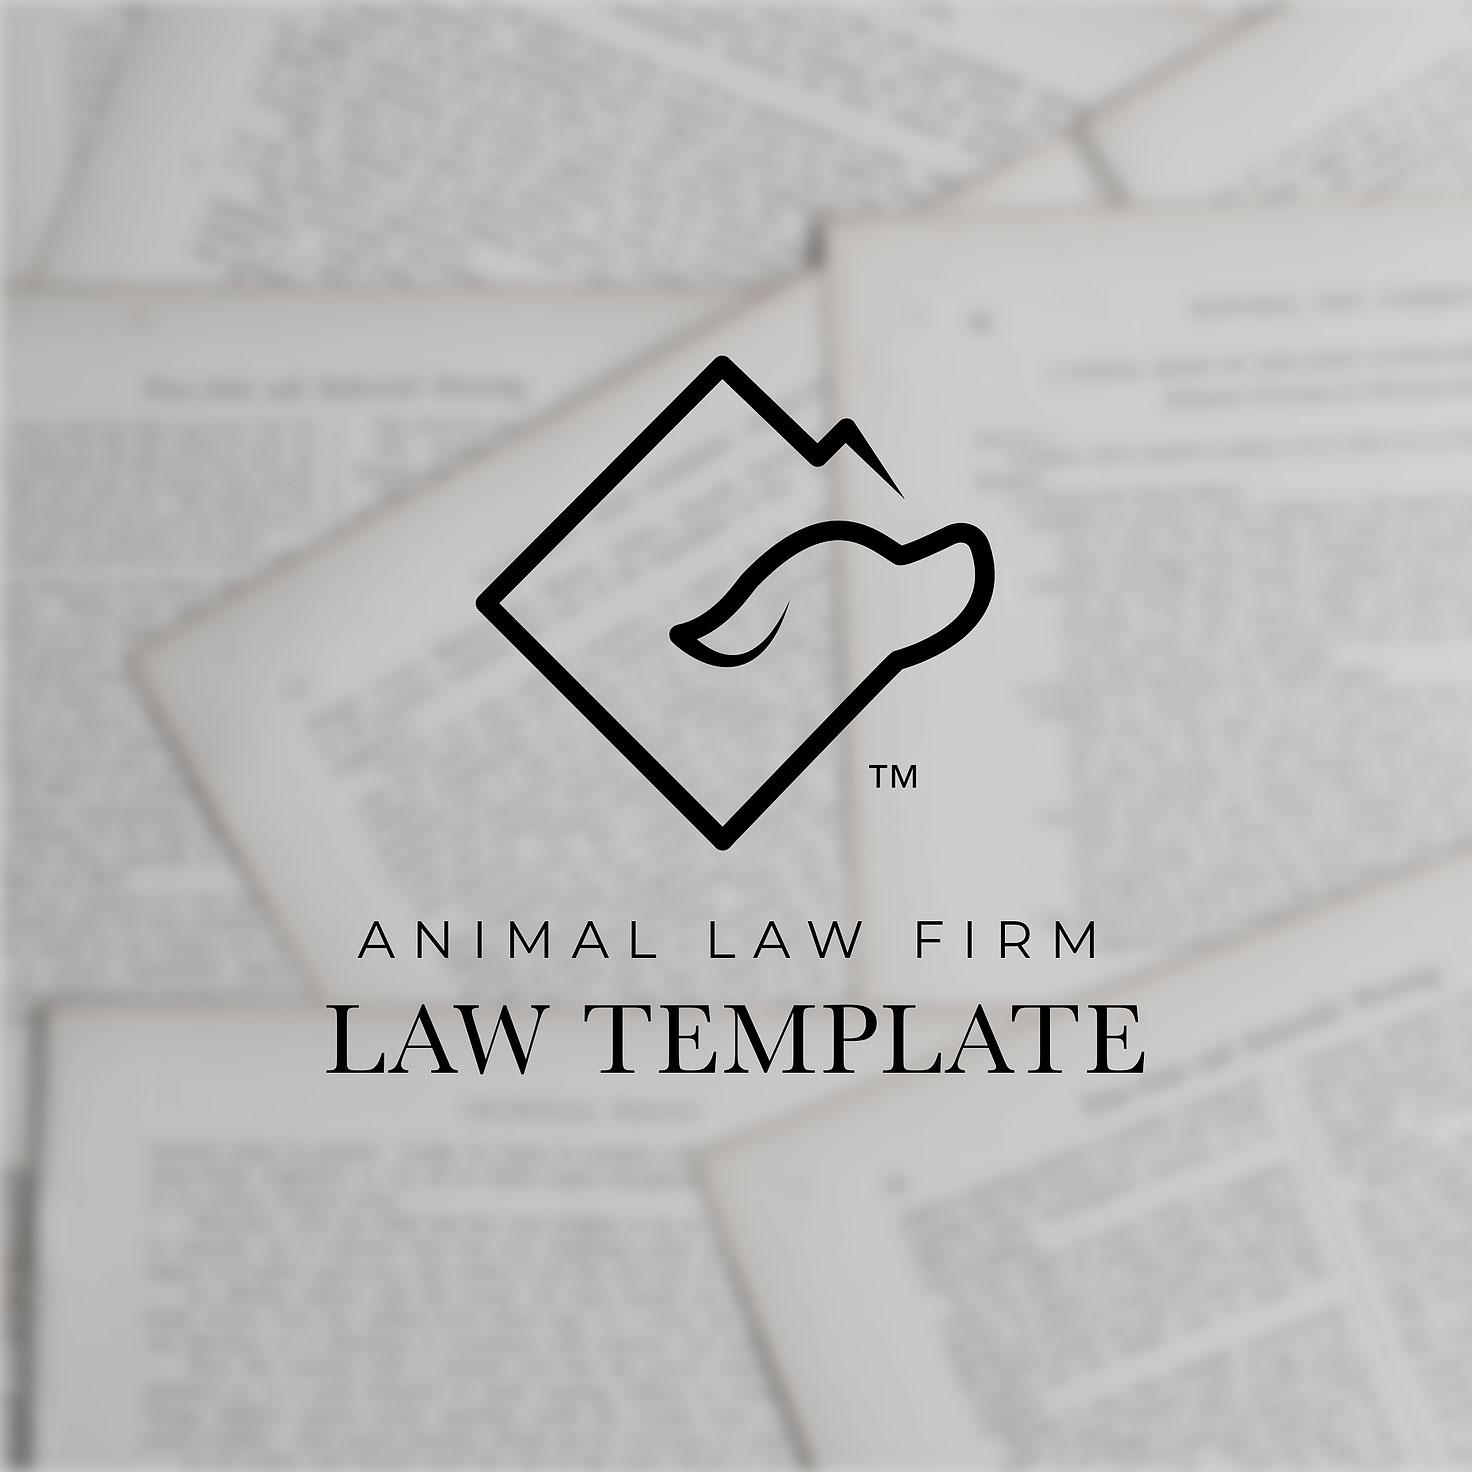 Complaint for state violations under CADA (Colorado Anti-Discrimination Act)